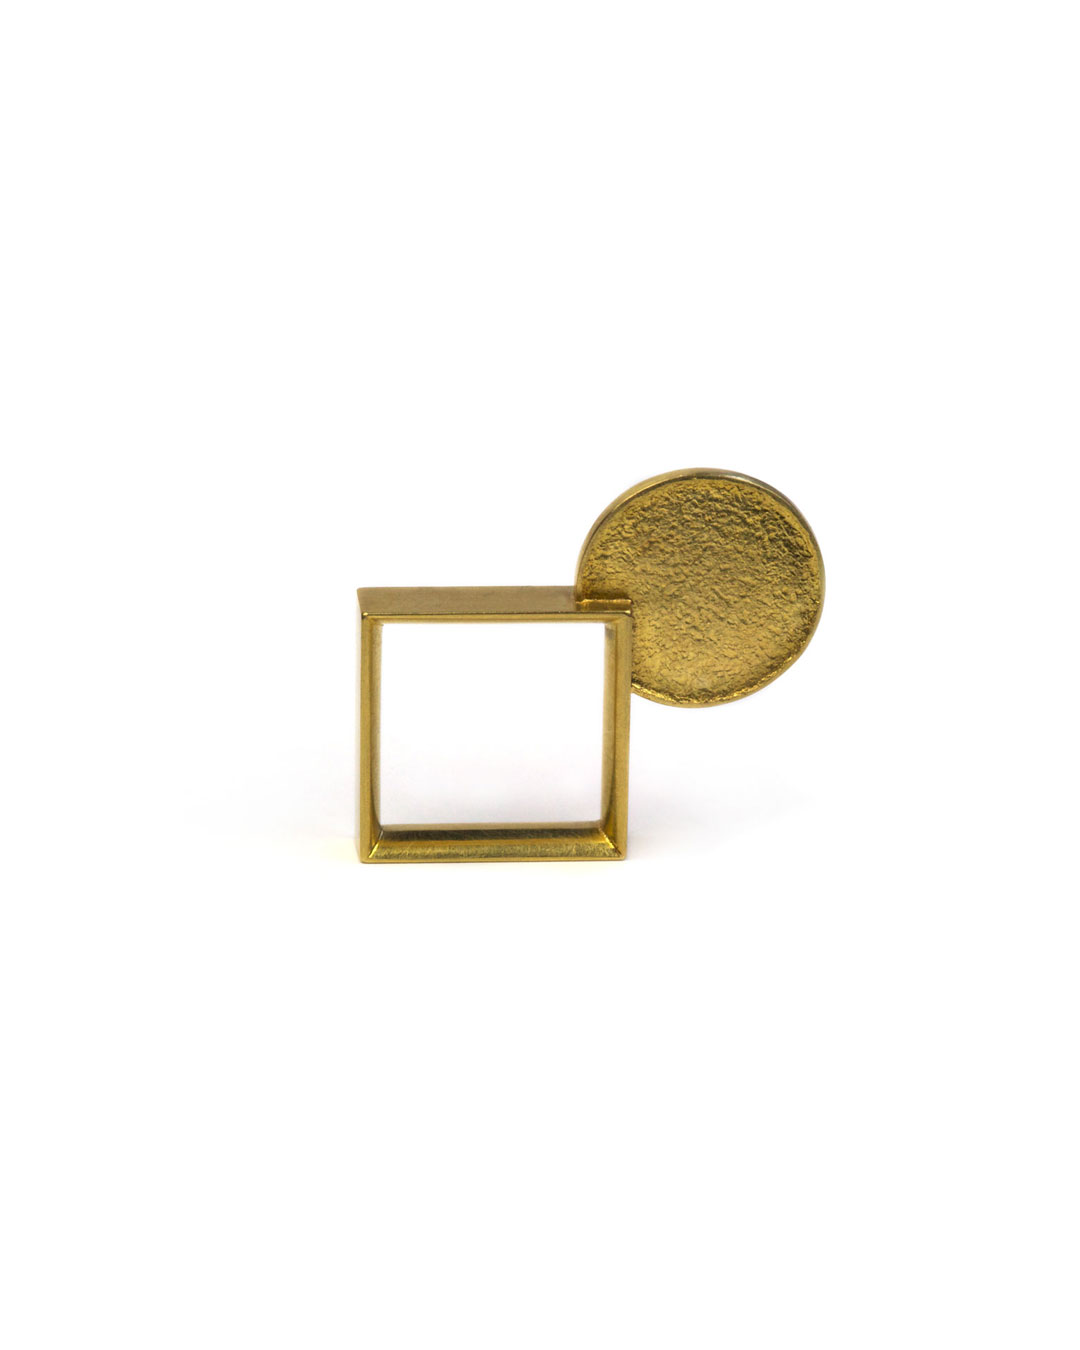 Okinari Kurokawa, untitled, 1996, ring; 18ct gold, 31 x 28 x 5 mm, €1250